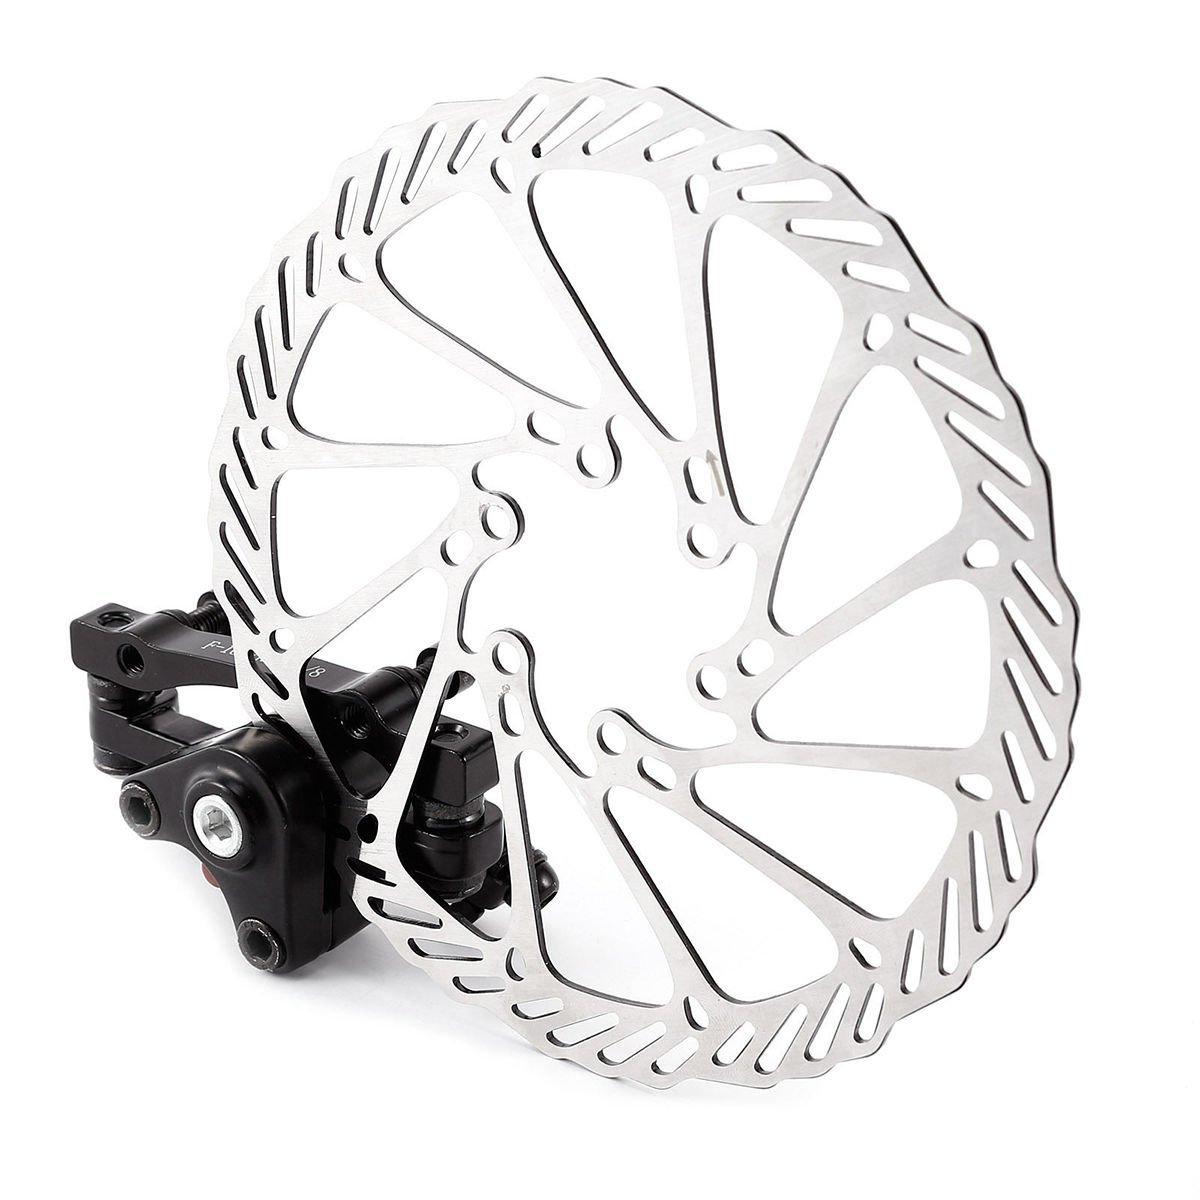 Cheap Bicycle Rear Disc Brake Conversion Kit, find Bicycle Rear Disc